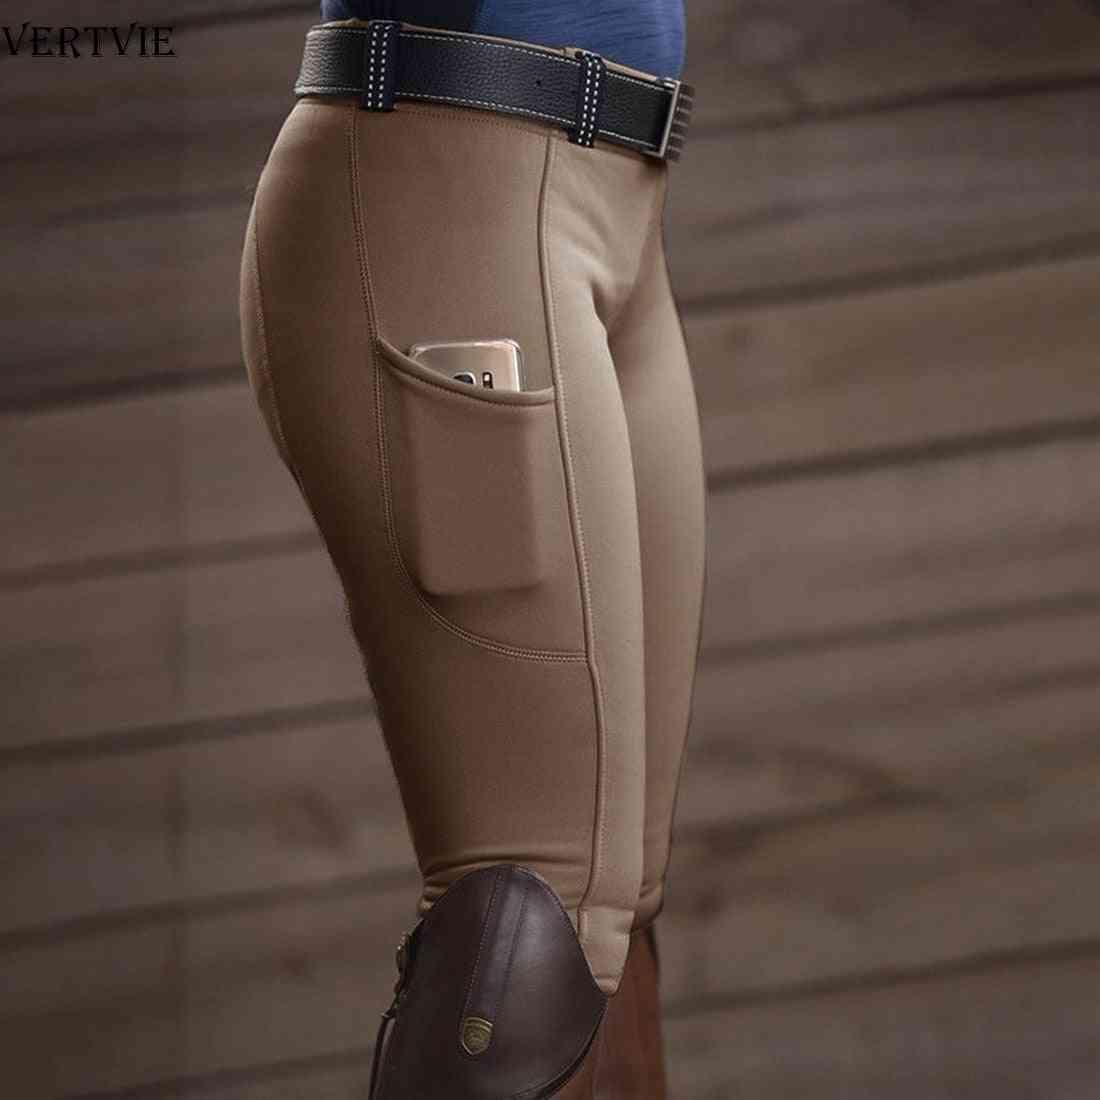 Women Fashion High Waist Elastic Equestrian Pants, Horse Racing Skinny Trousers